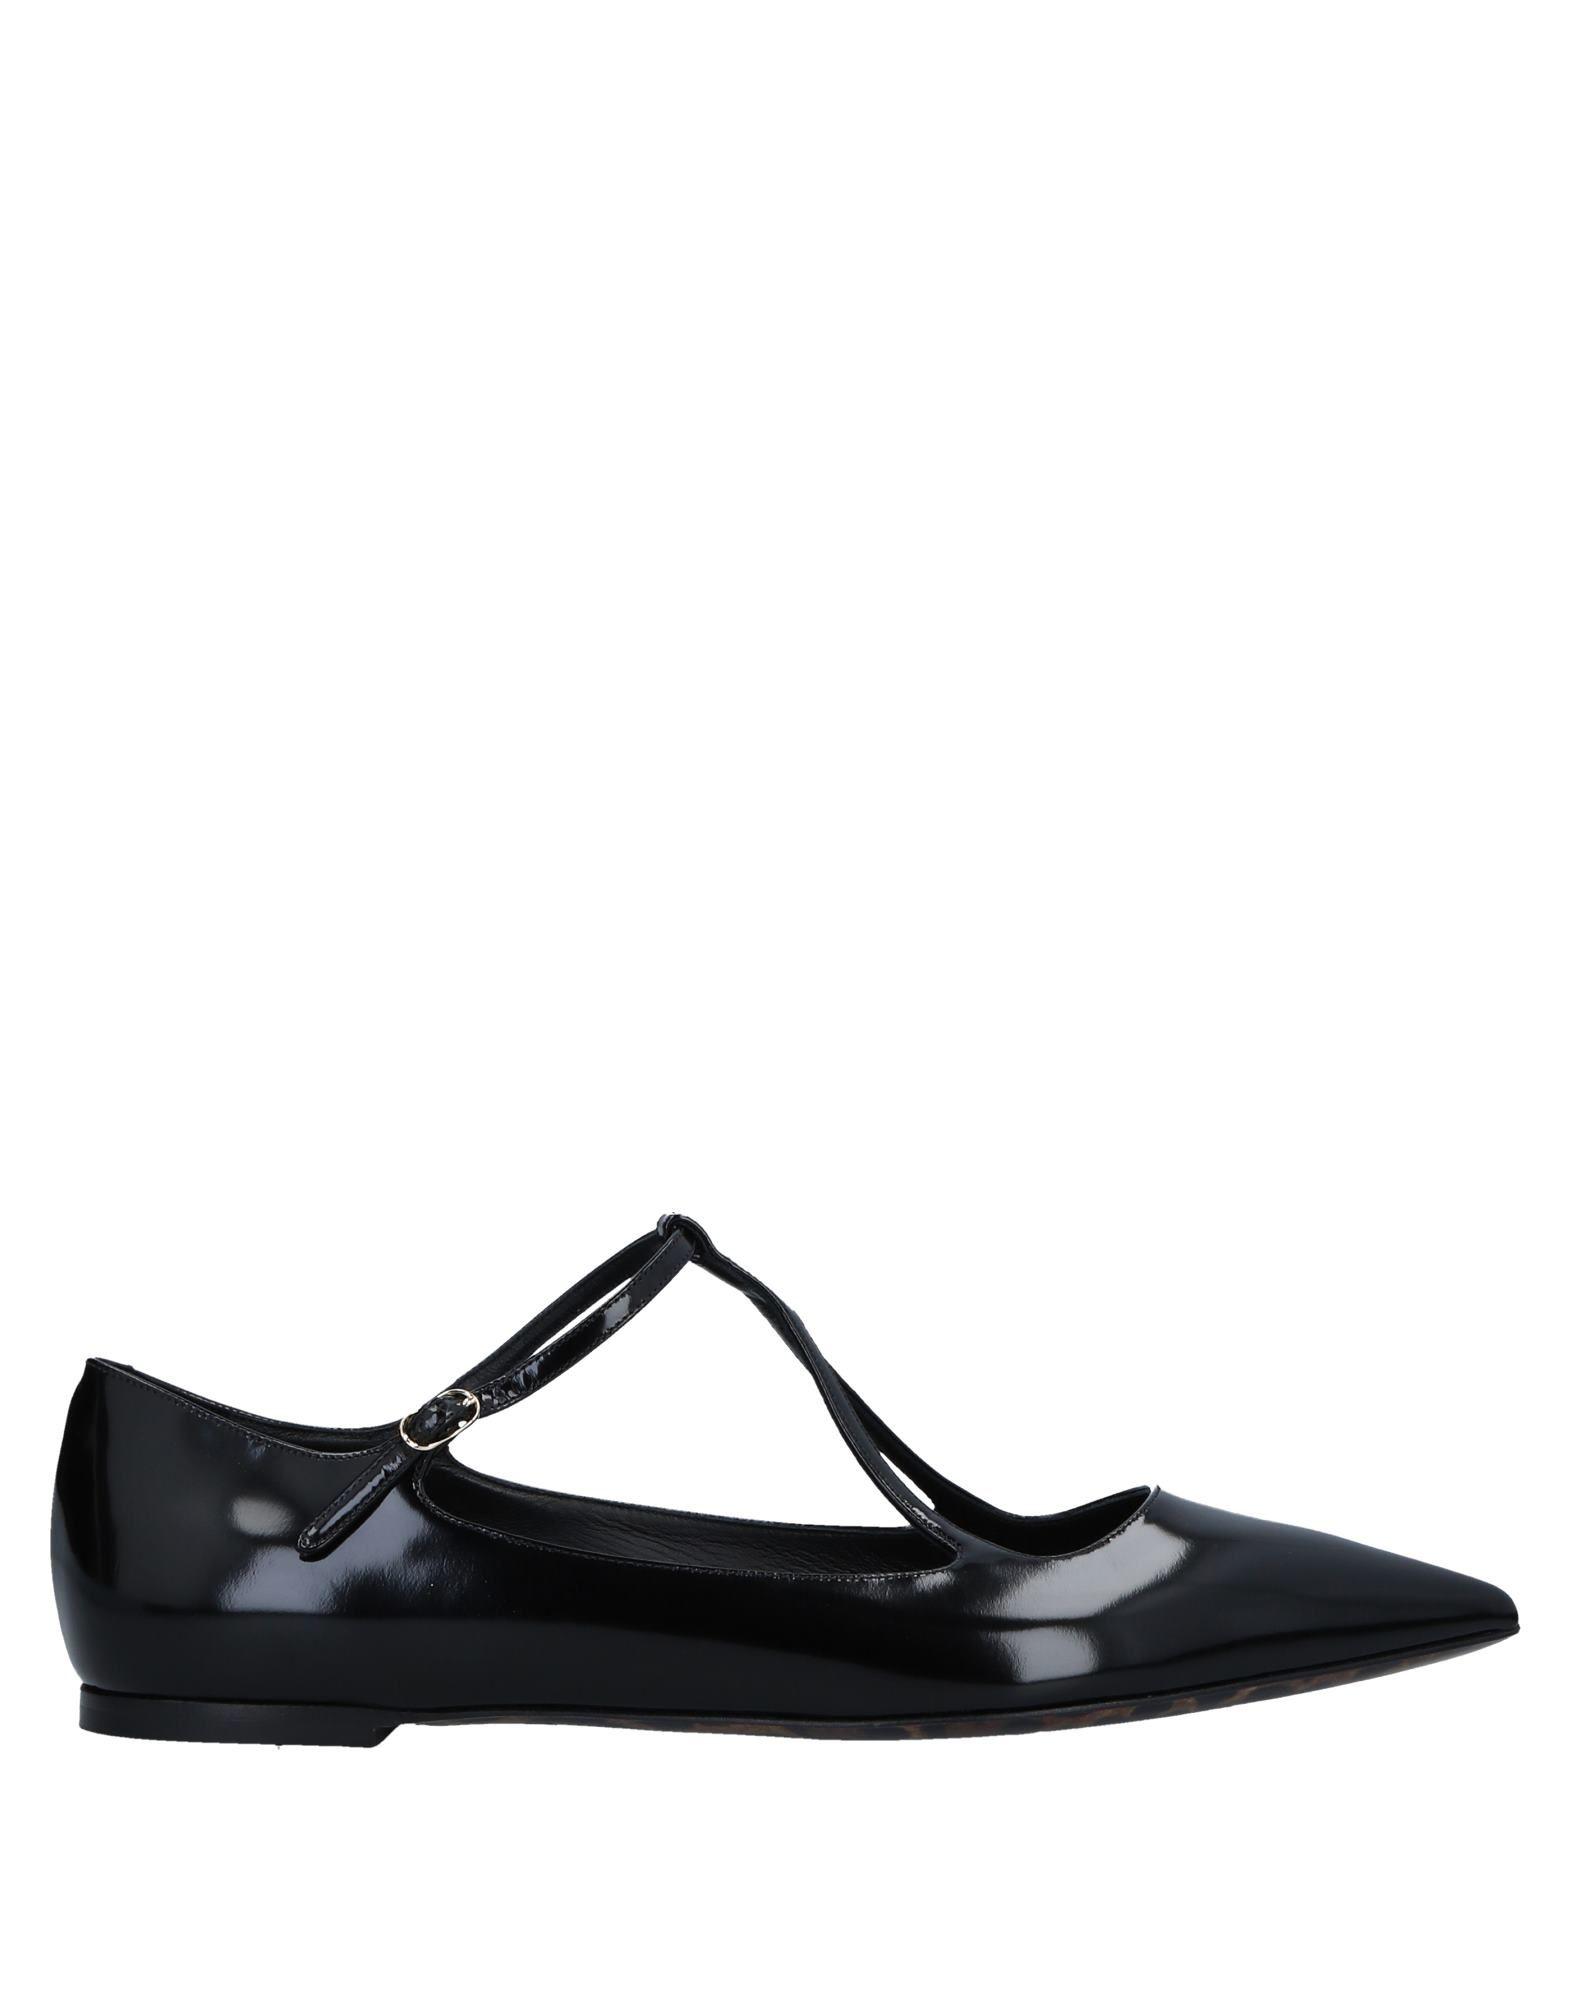 Ballerine Dolce & Gabbana Donna - 11540568JA